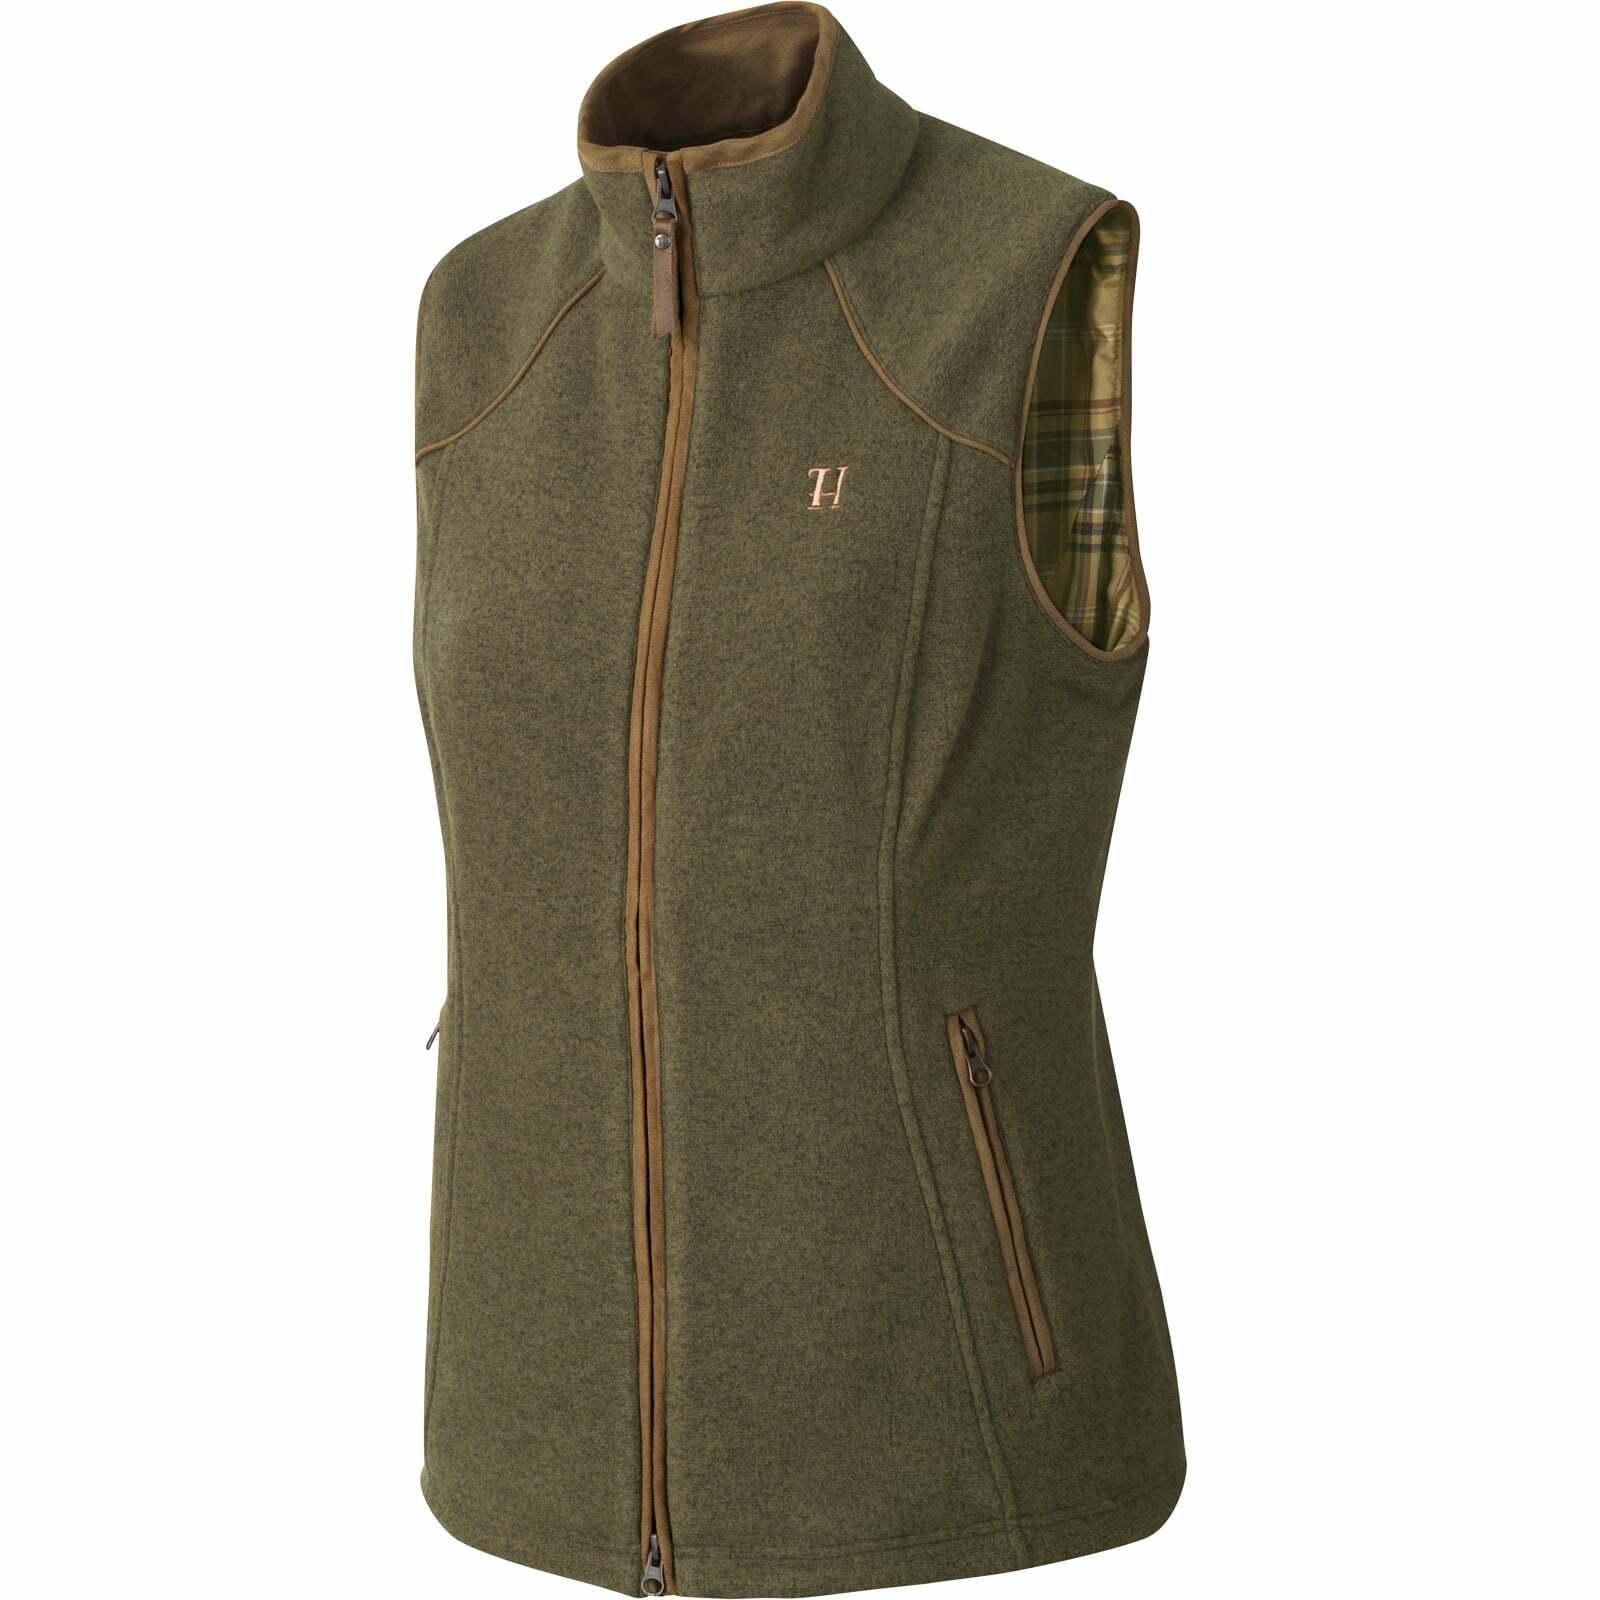 Harkila Ladies Sandhem Fleece Gilet - Dusty Lake Green